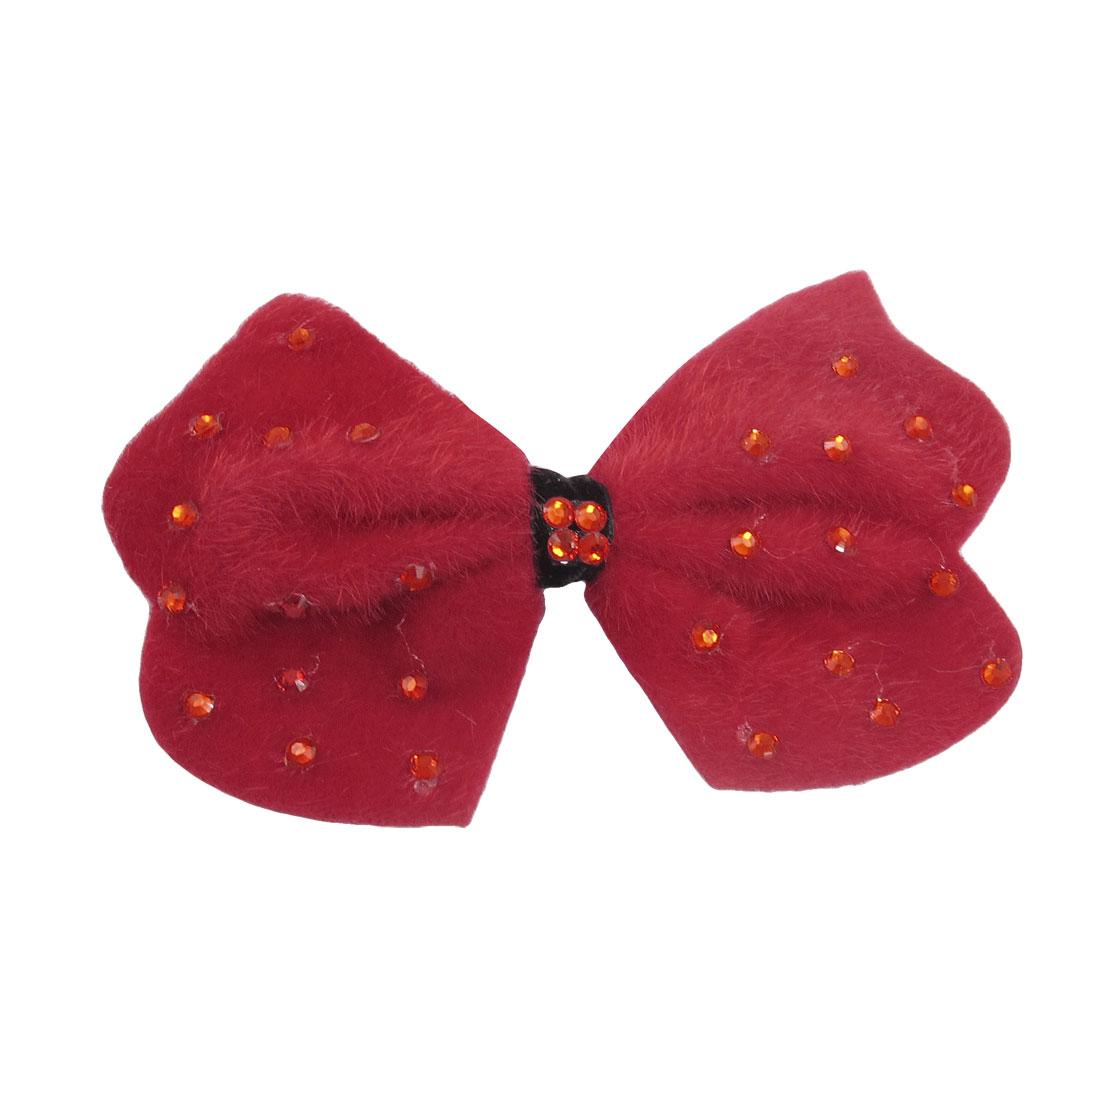 Red Felt Bowtie Shape Plastic Beads Decor Alligator Hair Clip